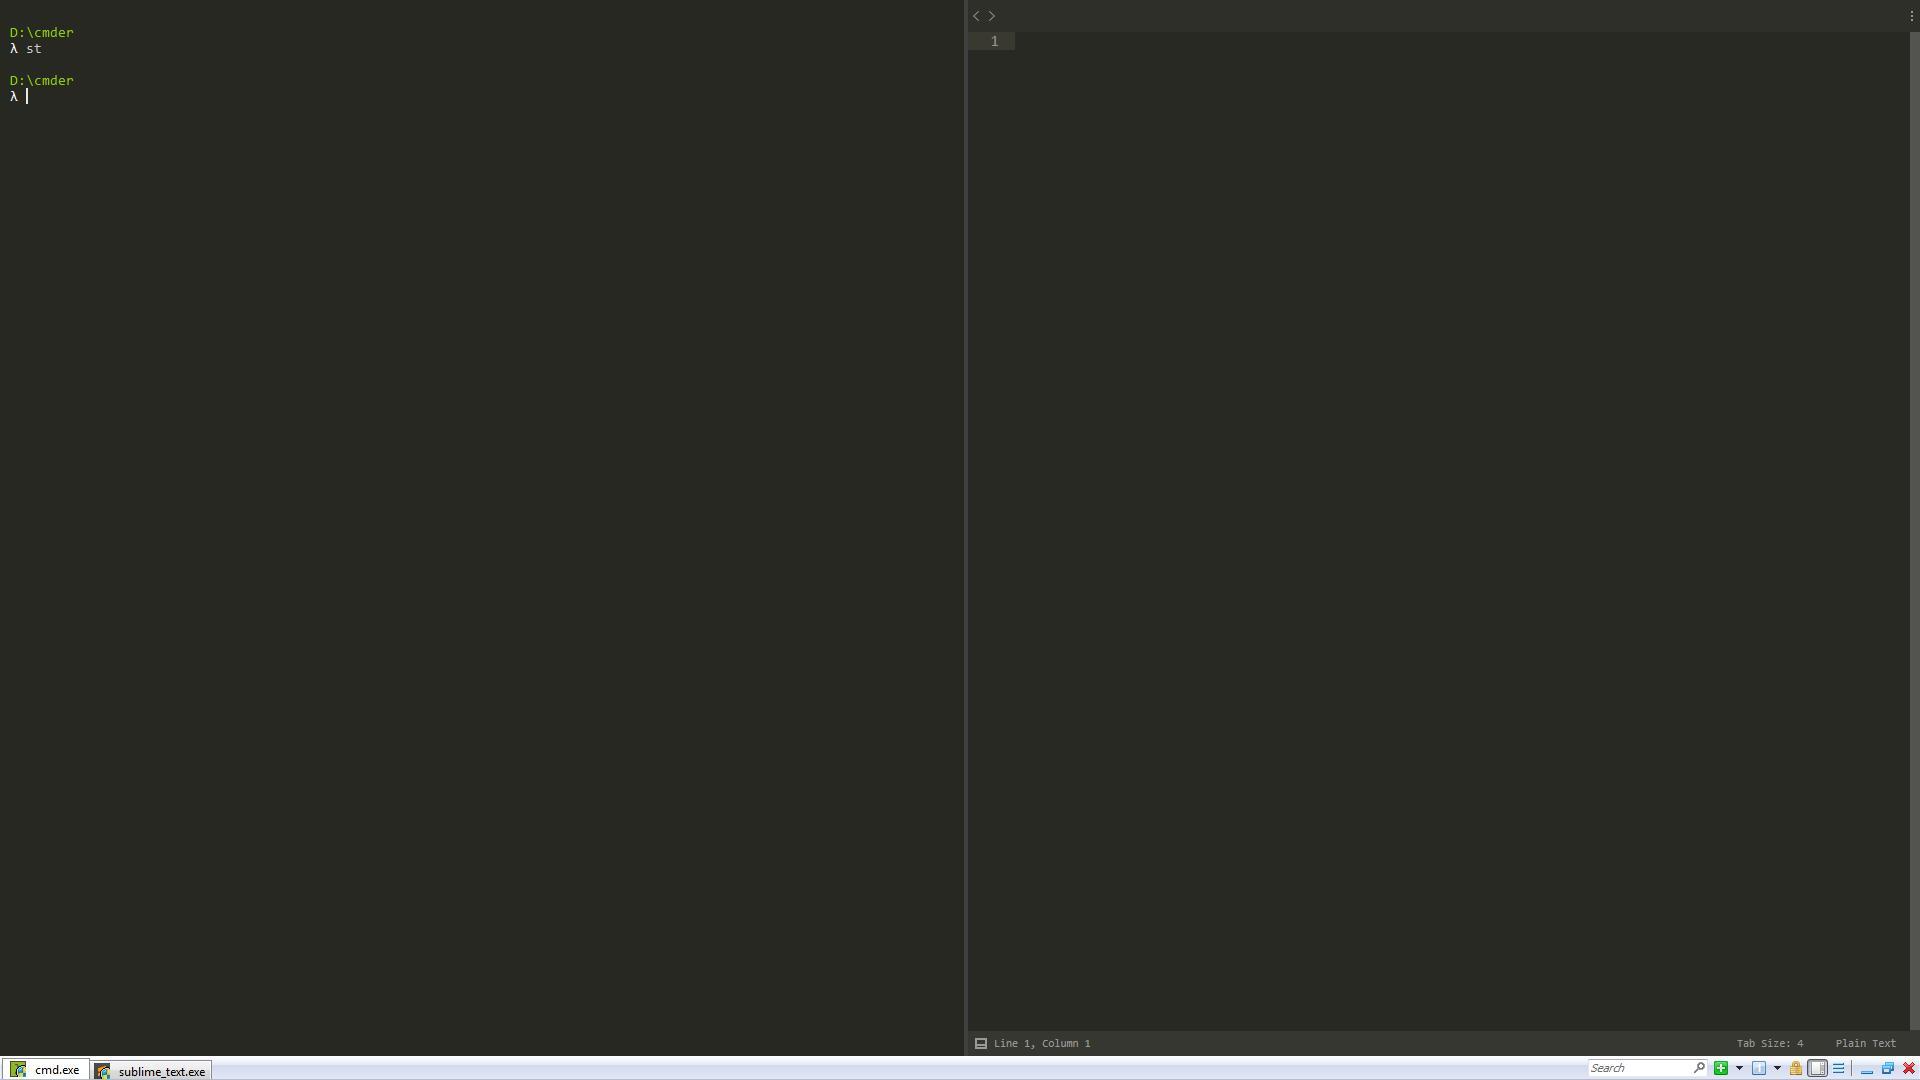 win端Cmder结合IDE/编辑器使用教程